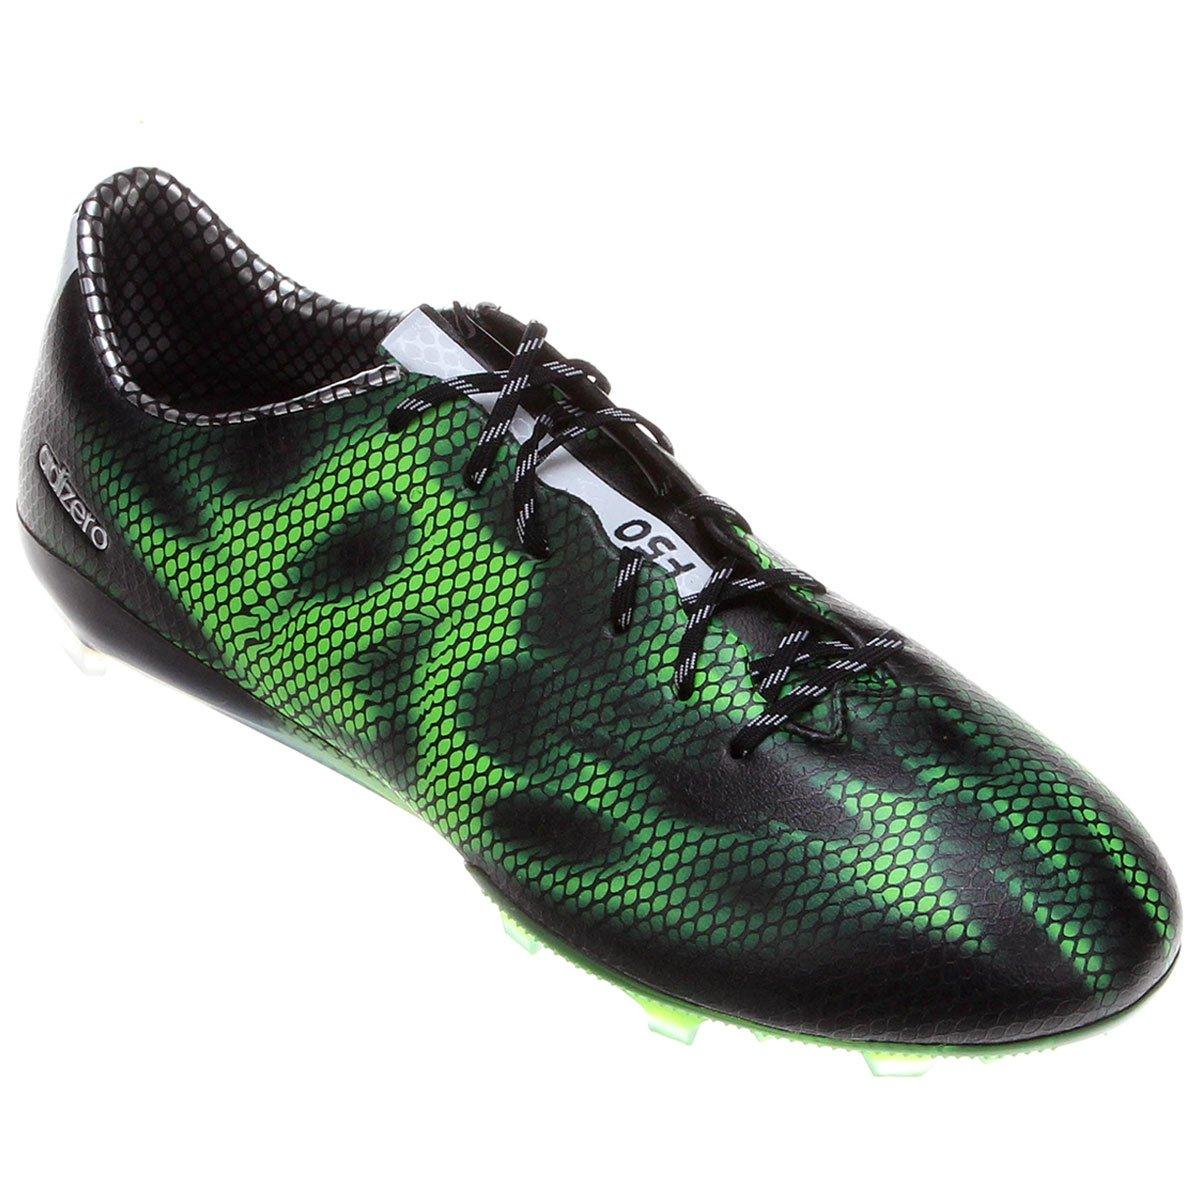 chuteiras adidas f50 verdes